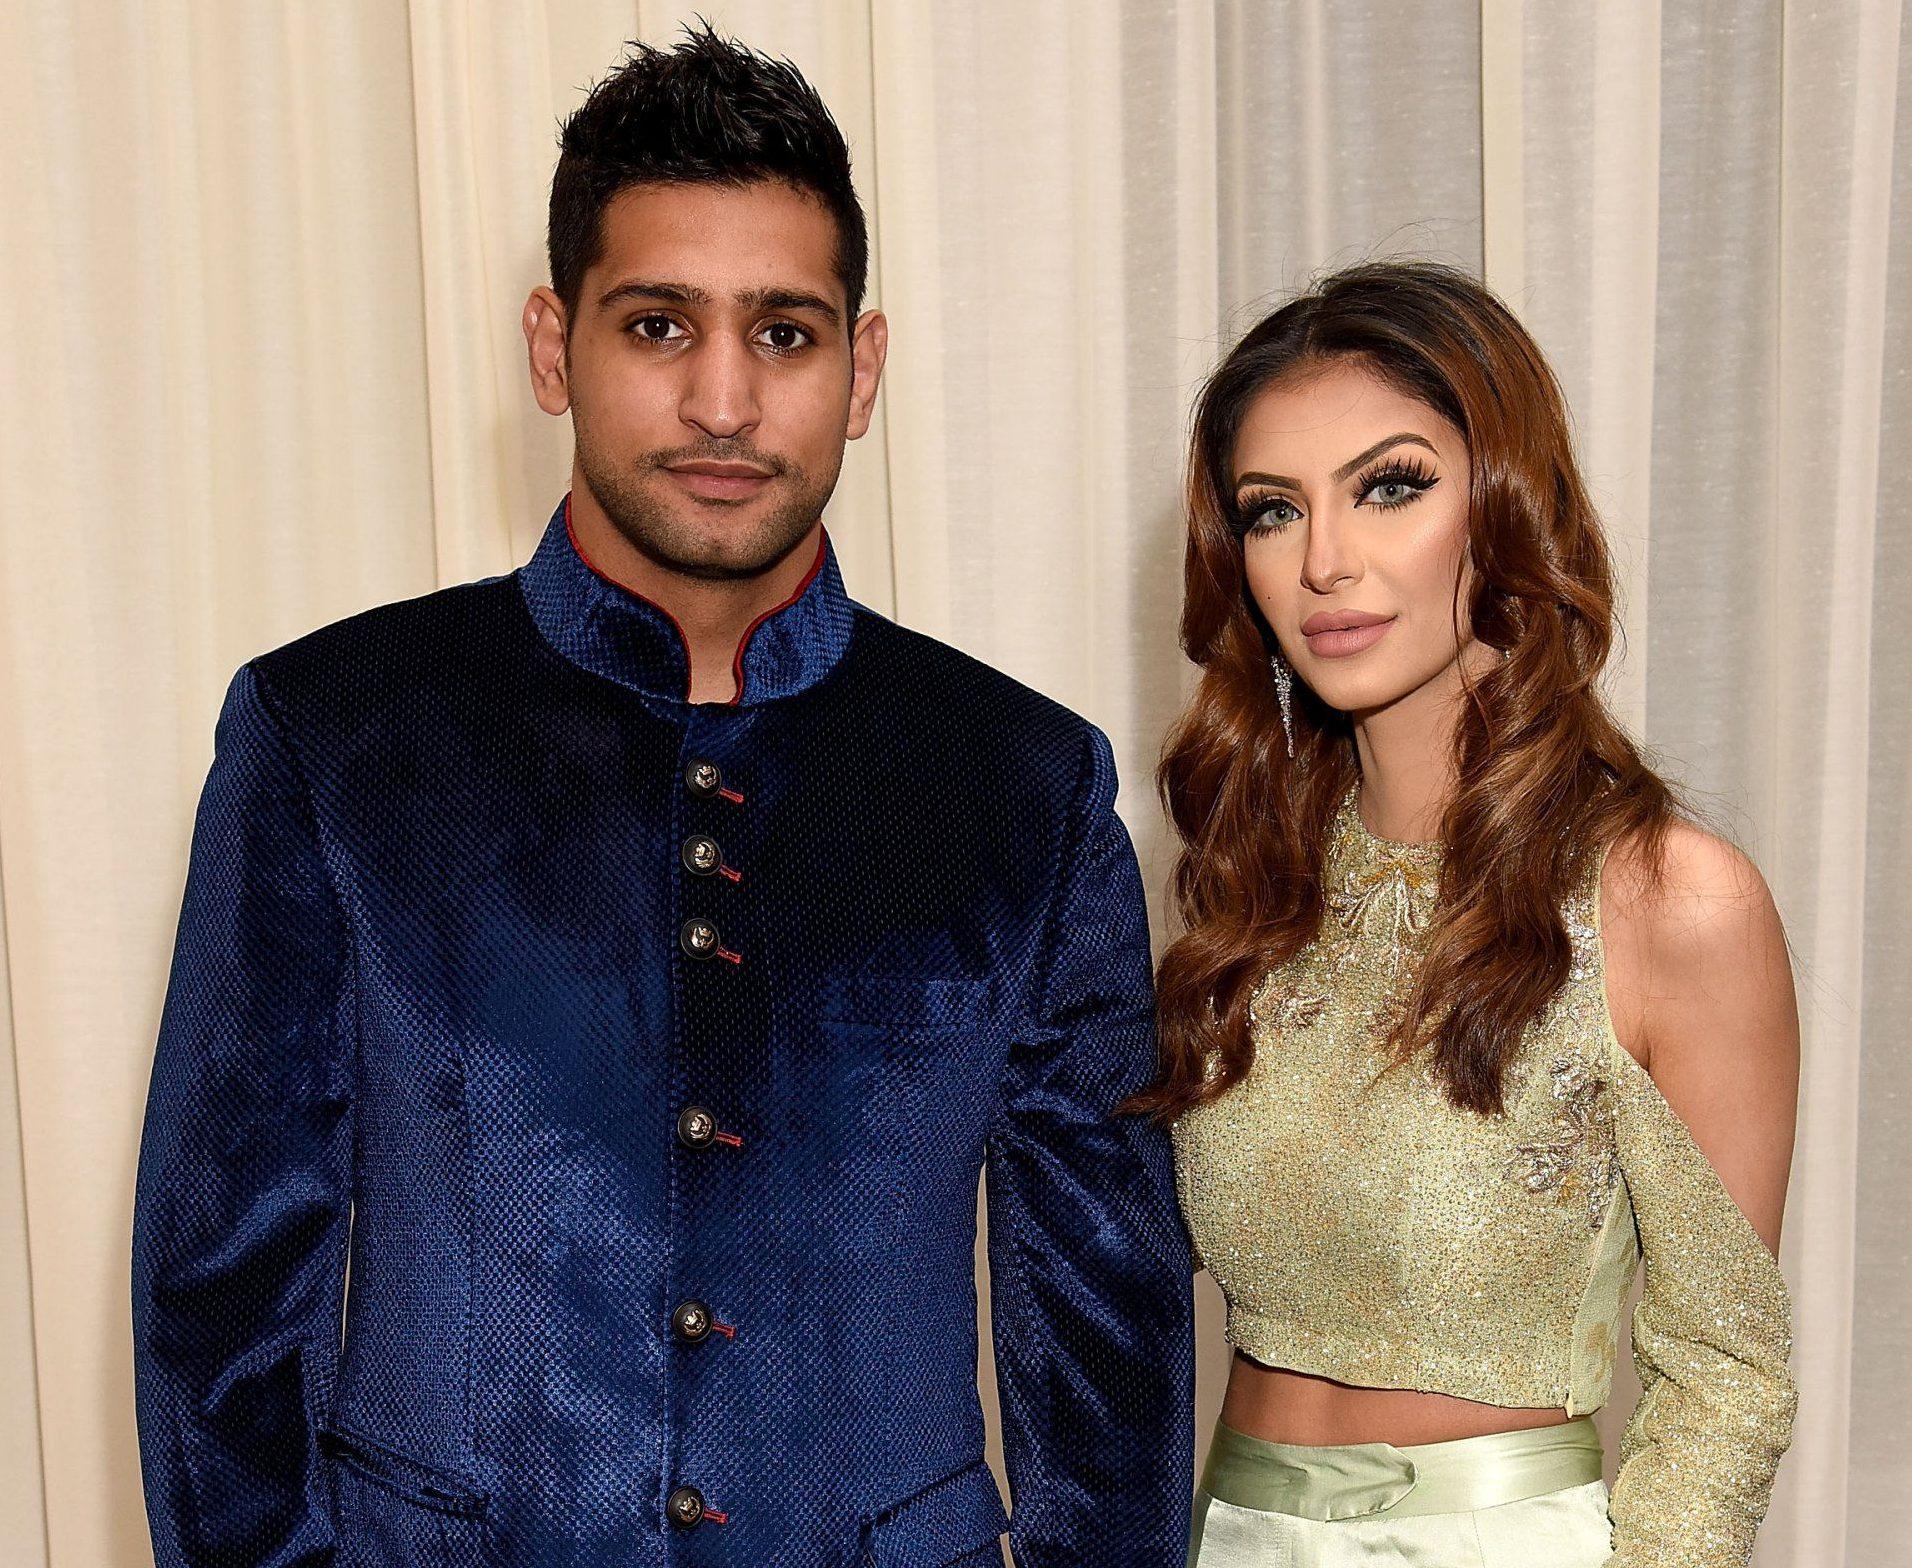 Amir Khan says I'm A Celebrity stint made him 'appreciate' estranged wife Faryal Makhdoom